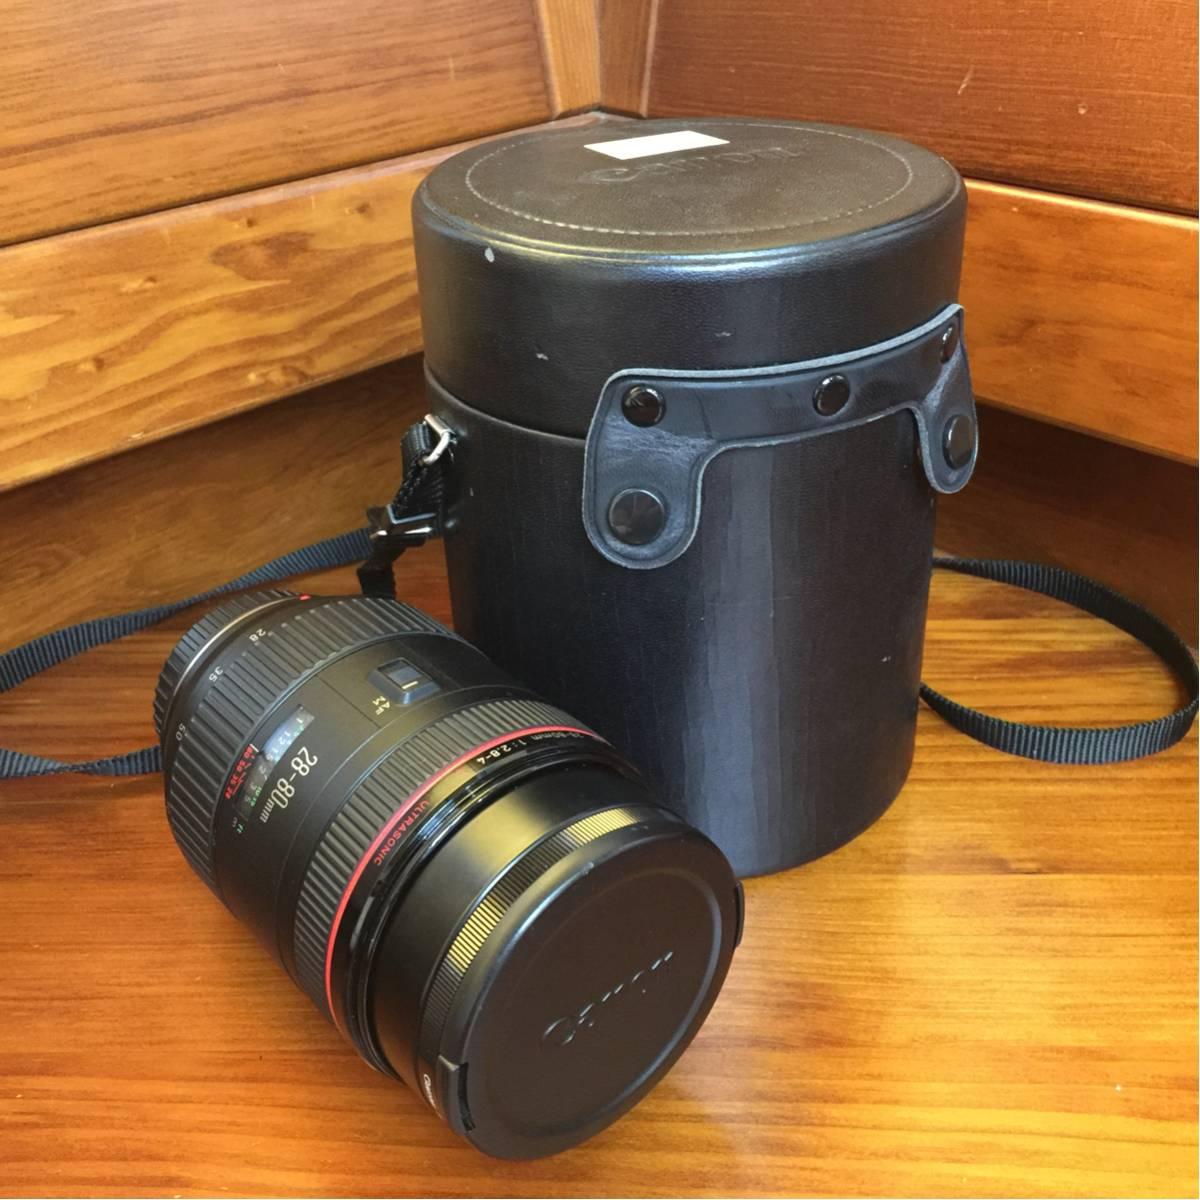 Canon キャノン ZOOM EF28-80mm F2.8-4  ULTRASONIC Canon 72mm L skylight 1x フィルター付き 純正革レンズバッグ   超美品